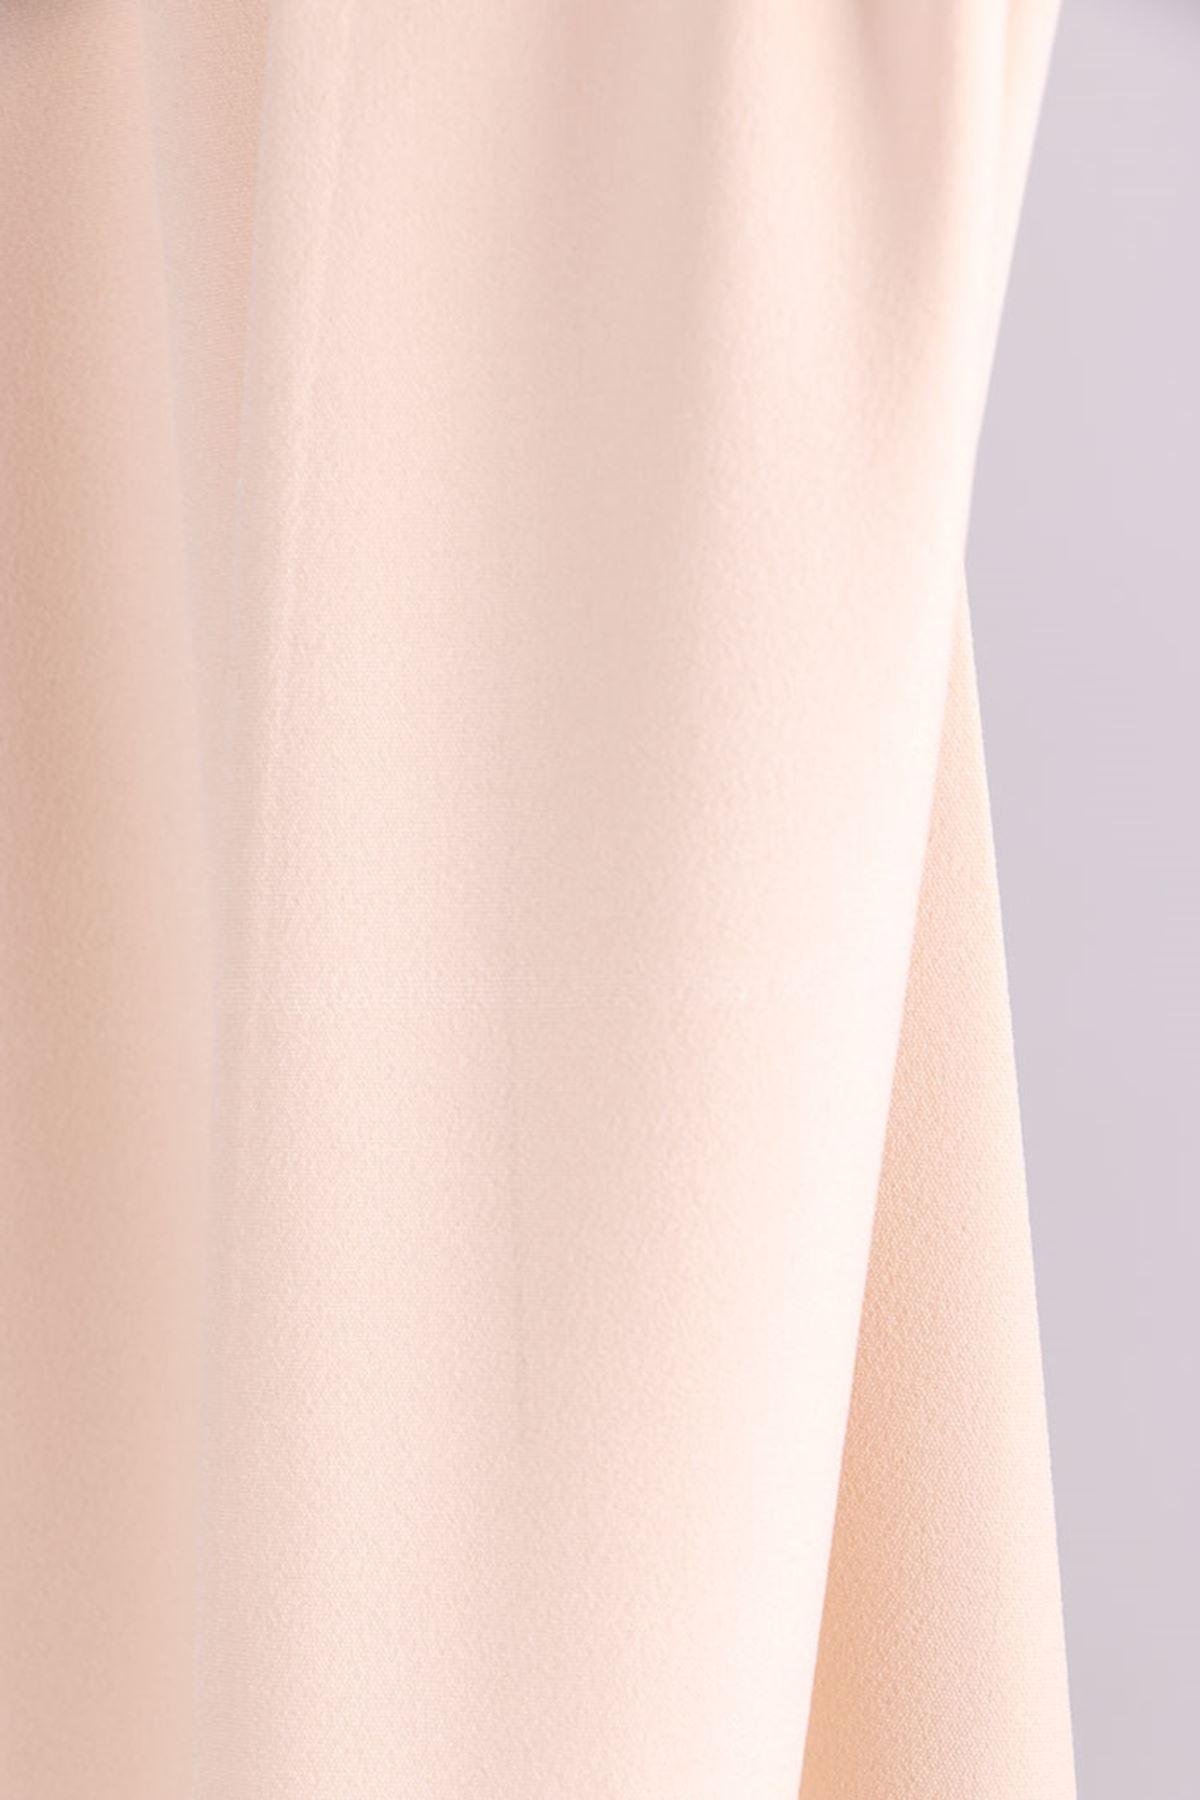 D-9025-1 Büyük Beden Defolu Beli Lastikli  Boru Paça Pantolon - Taş